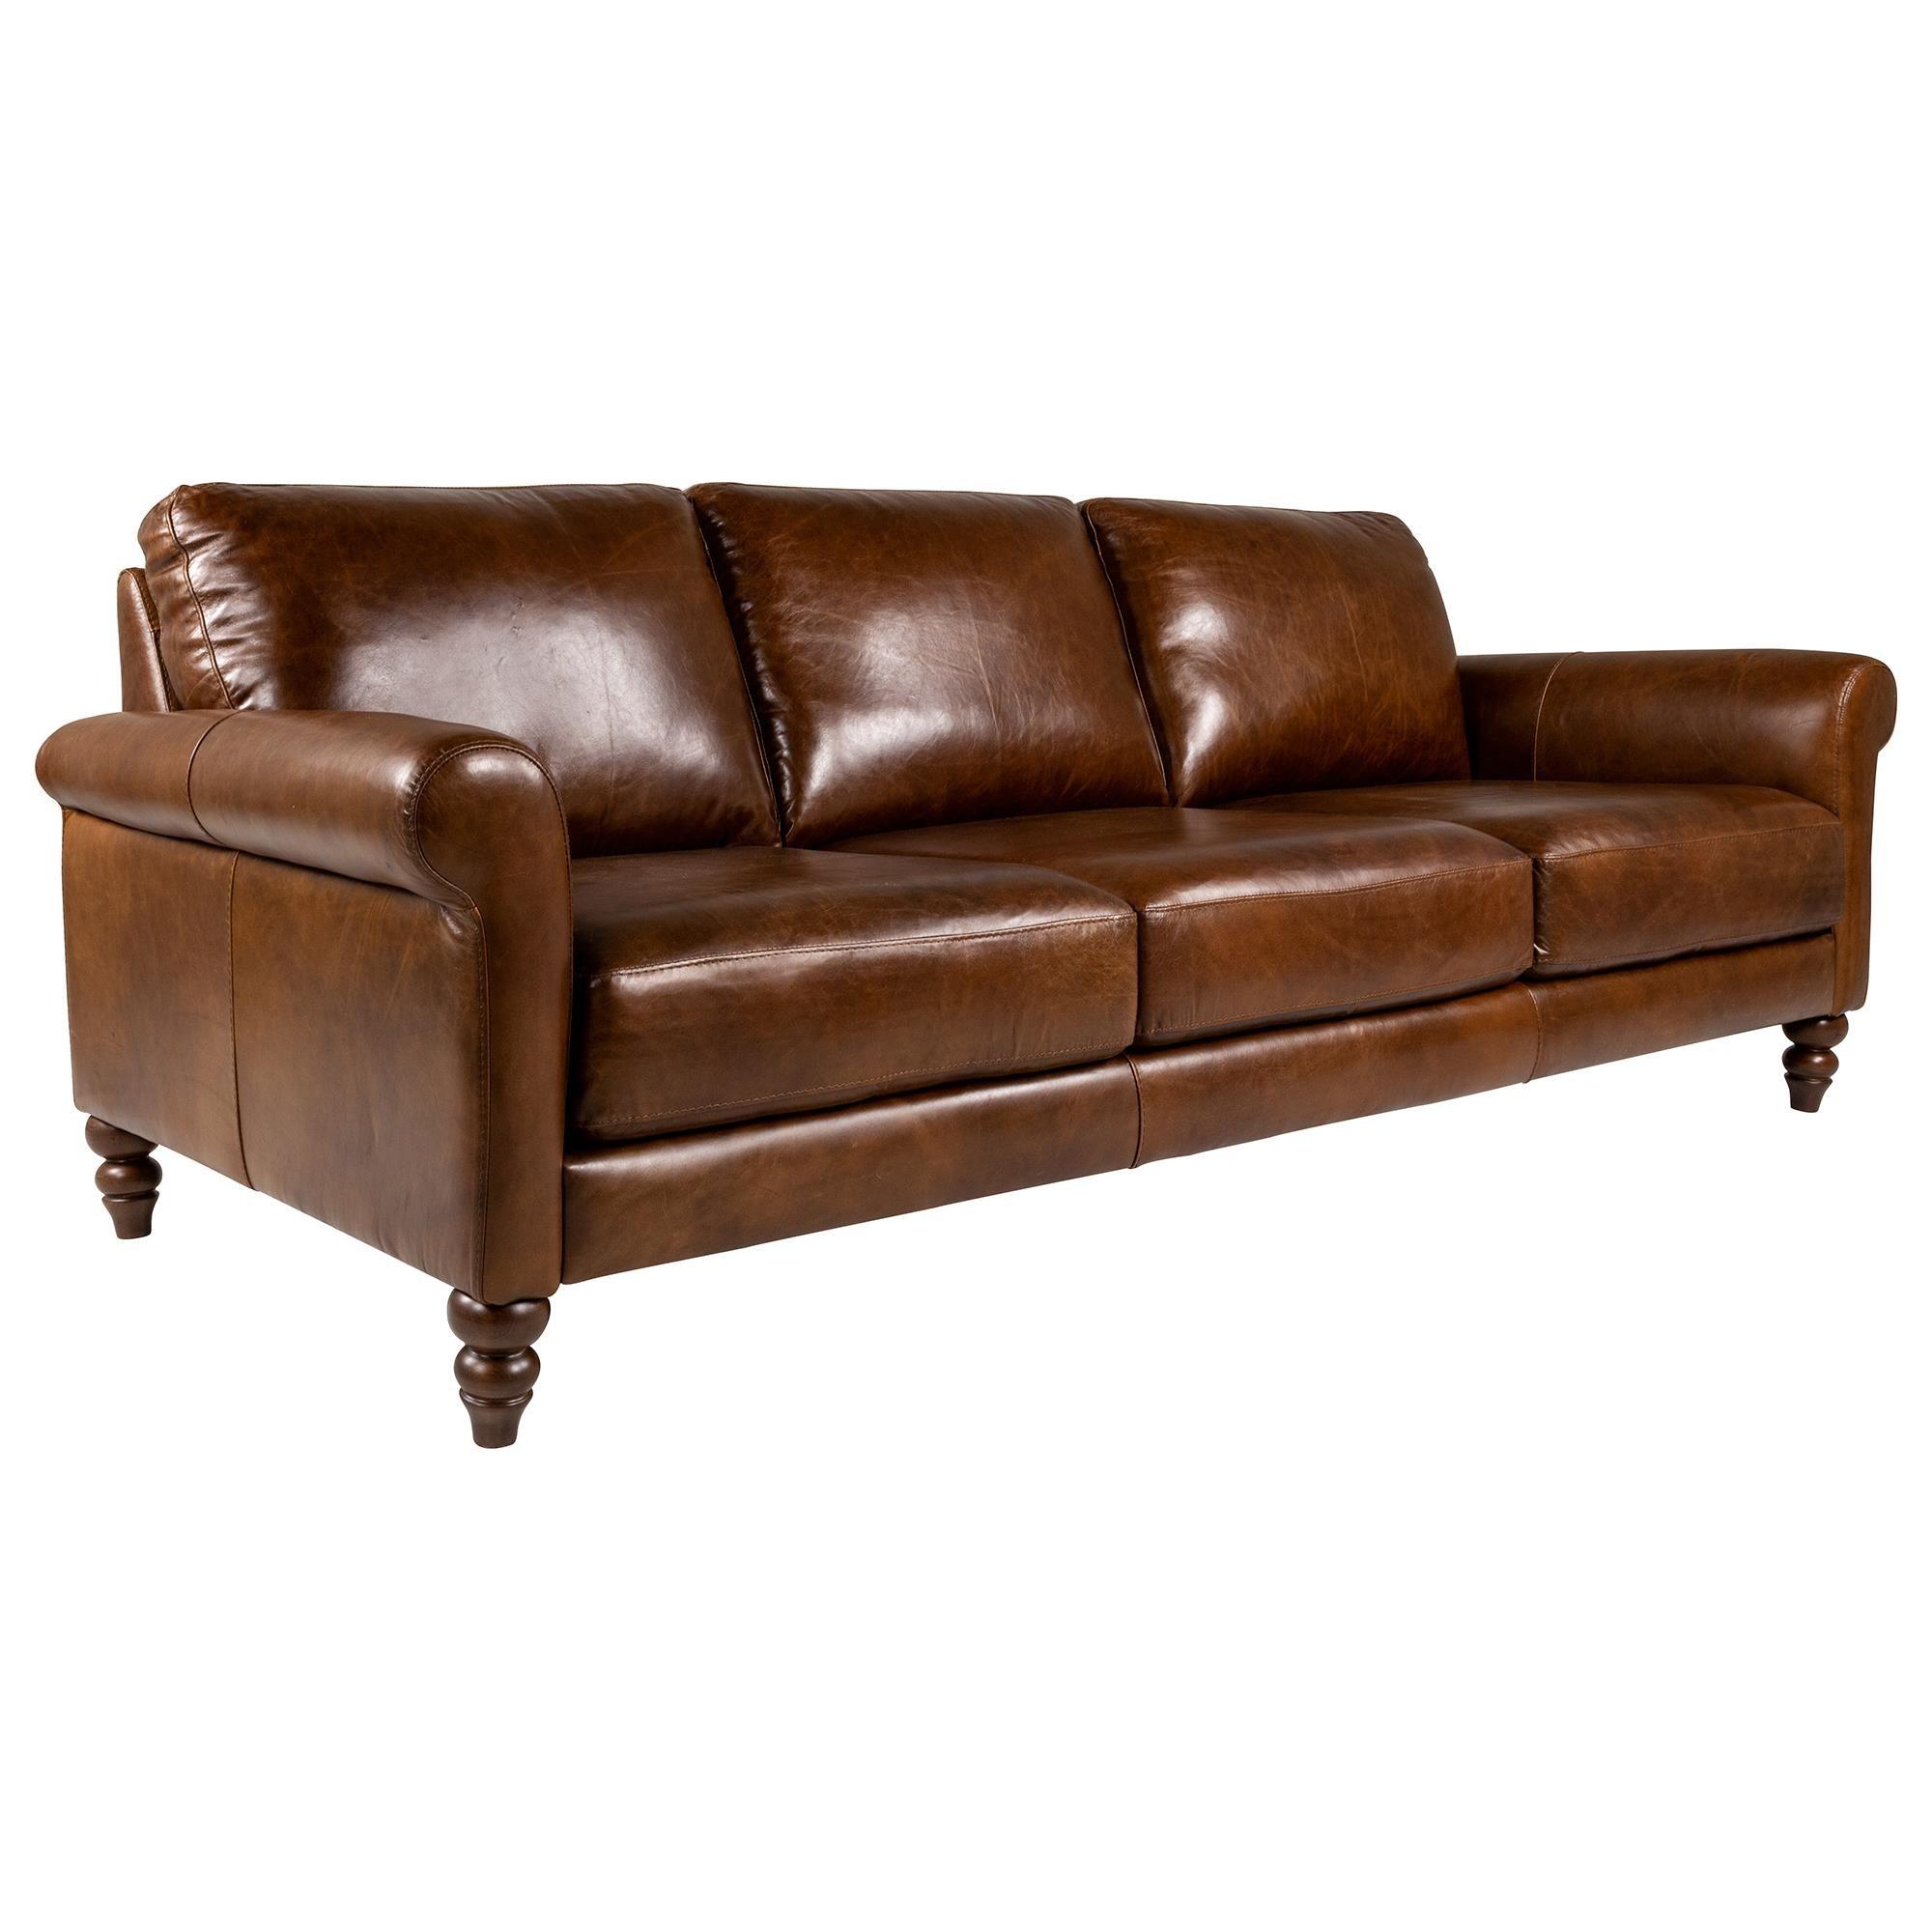 Softline Leather Sofa In Dallas Chestnut Natural Marked Top Grain Leather Nebraska Furniture Mart Nebraska Furniture Mart Leather Sofa Top Grain Leather